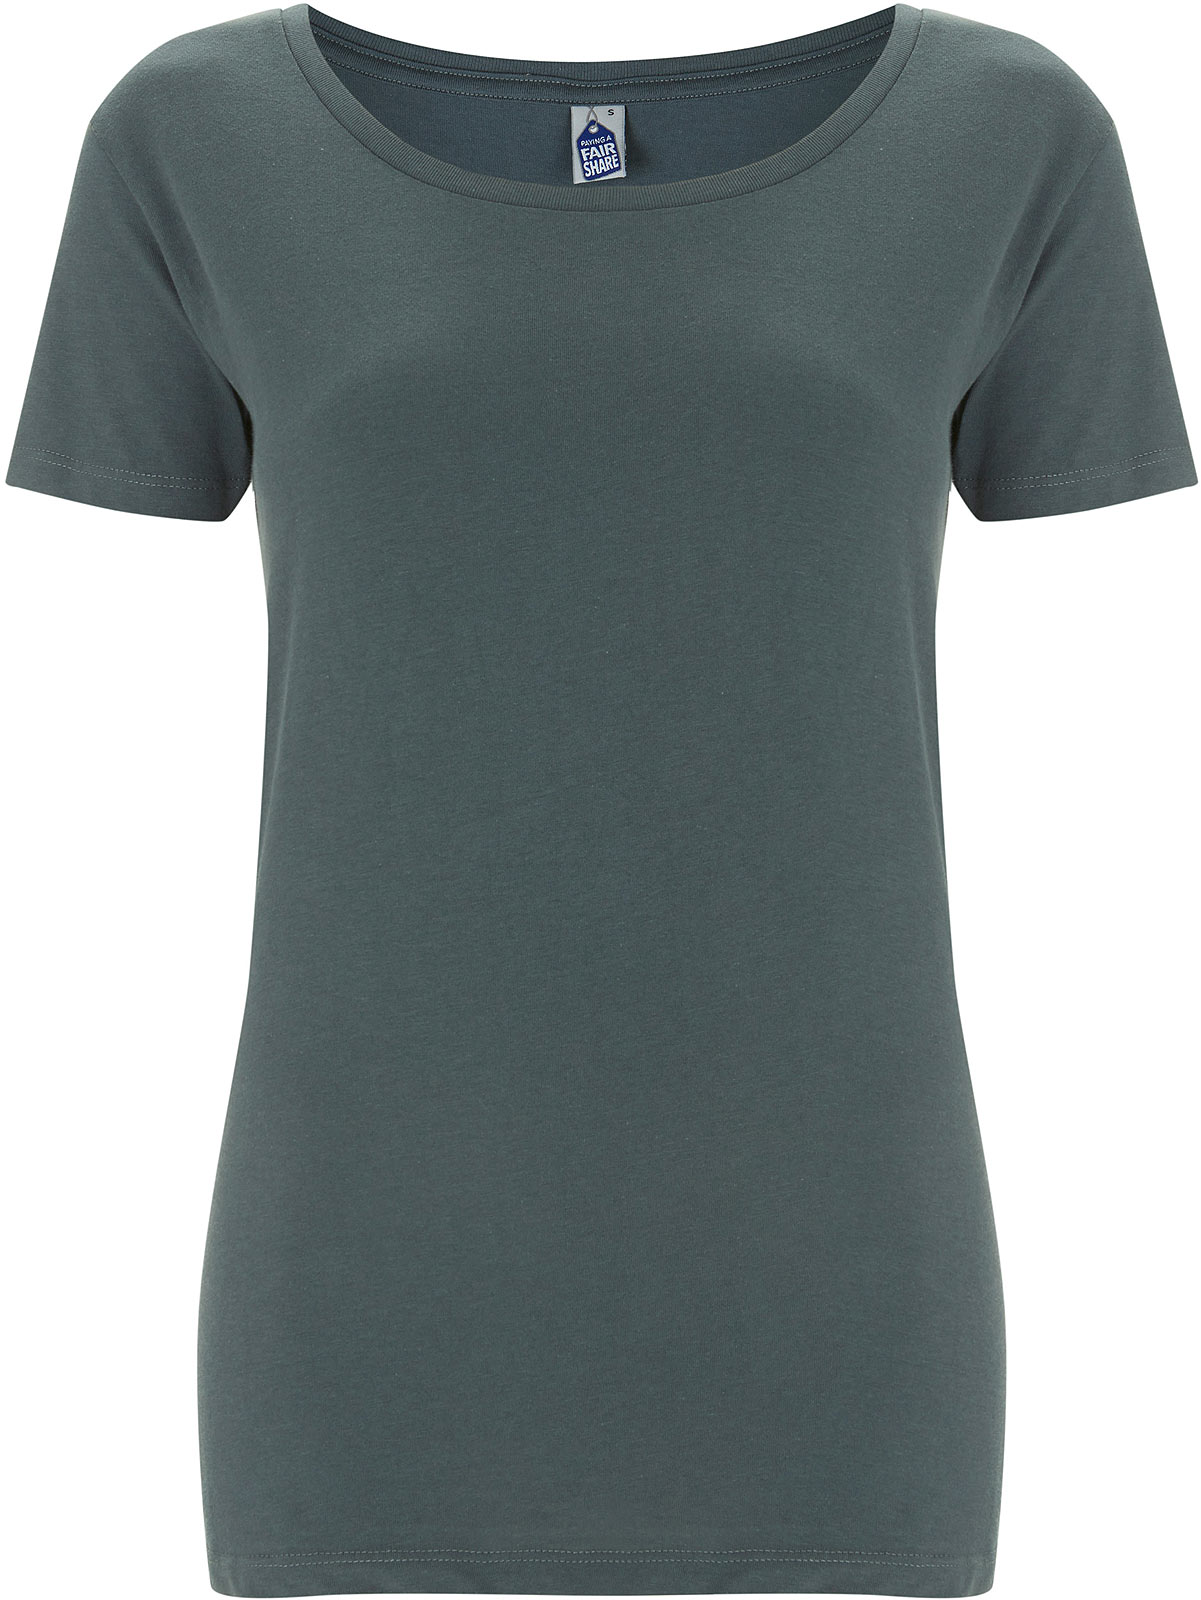 huge selection of 6ed7e de366 T-Shirt aus Fairtrade Bio-Baumwolle - light charcoal